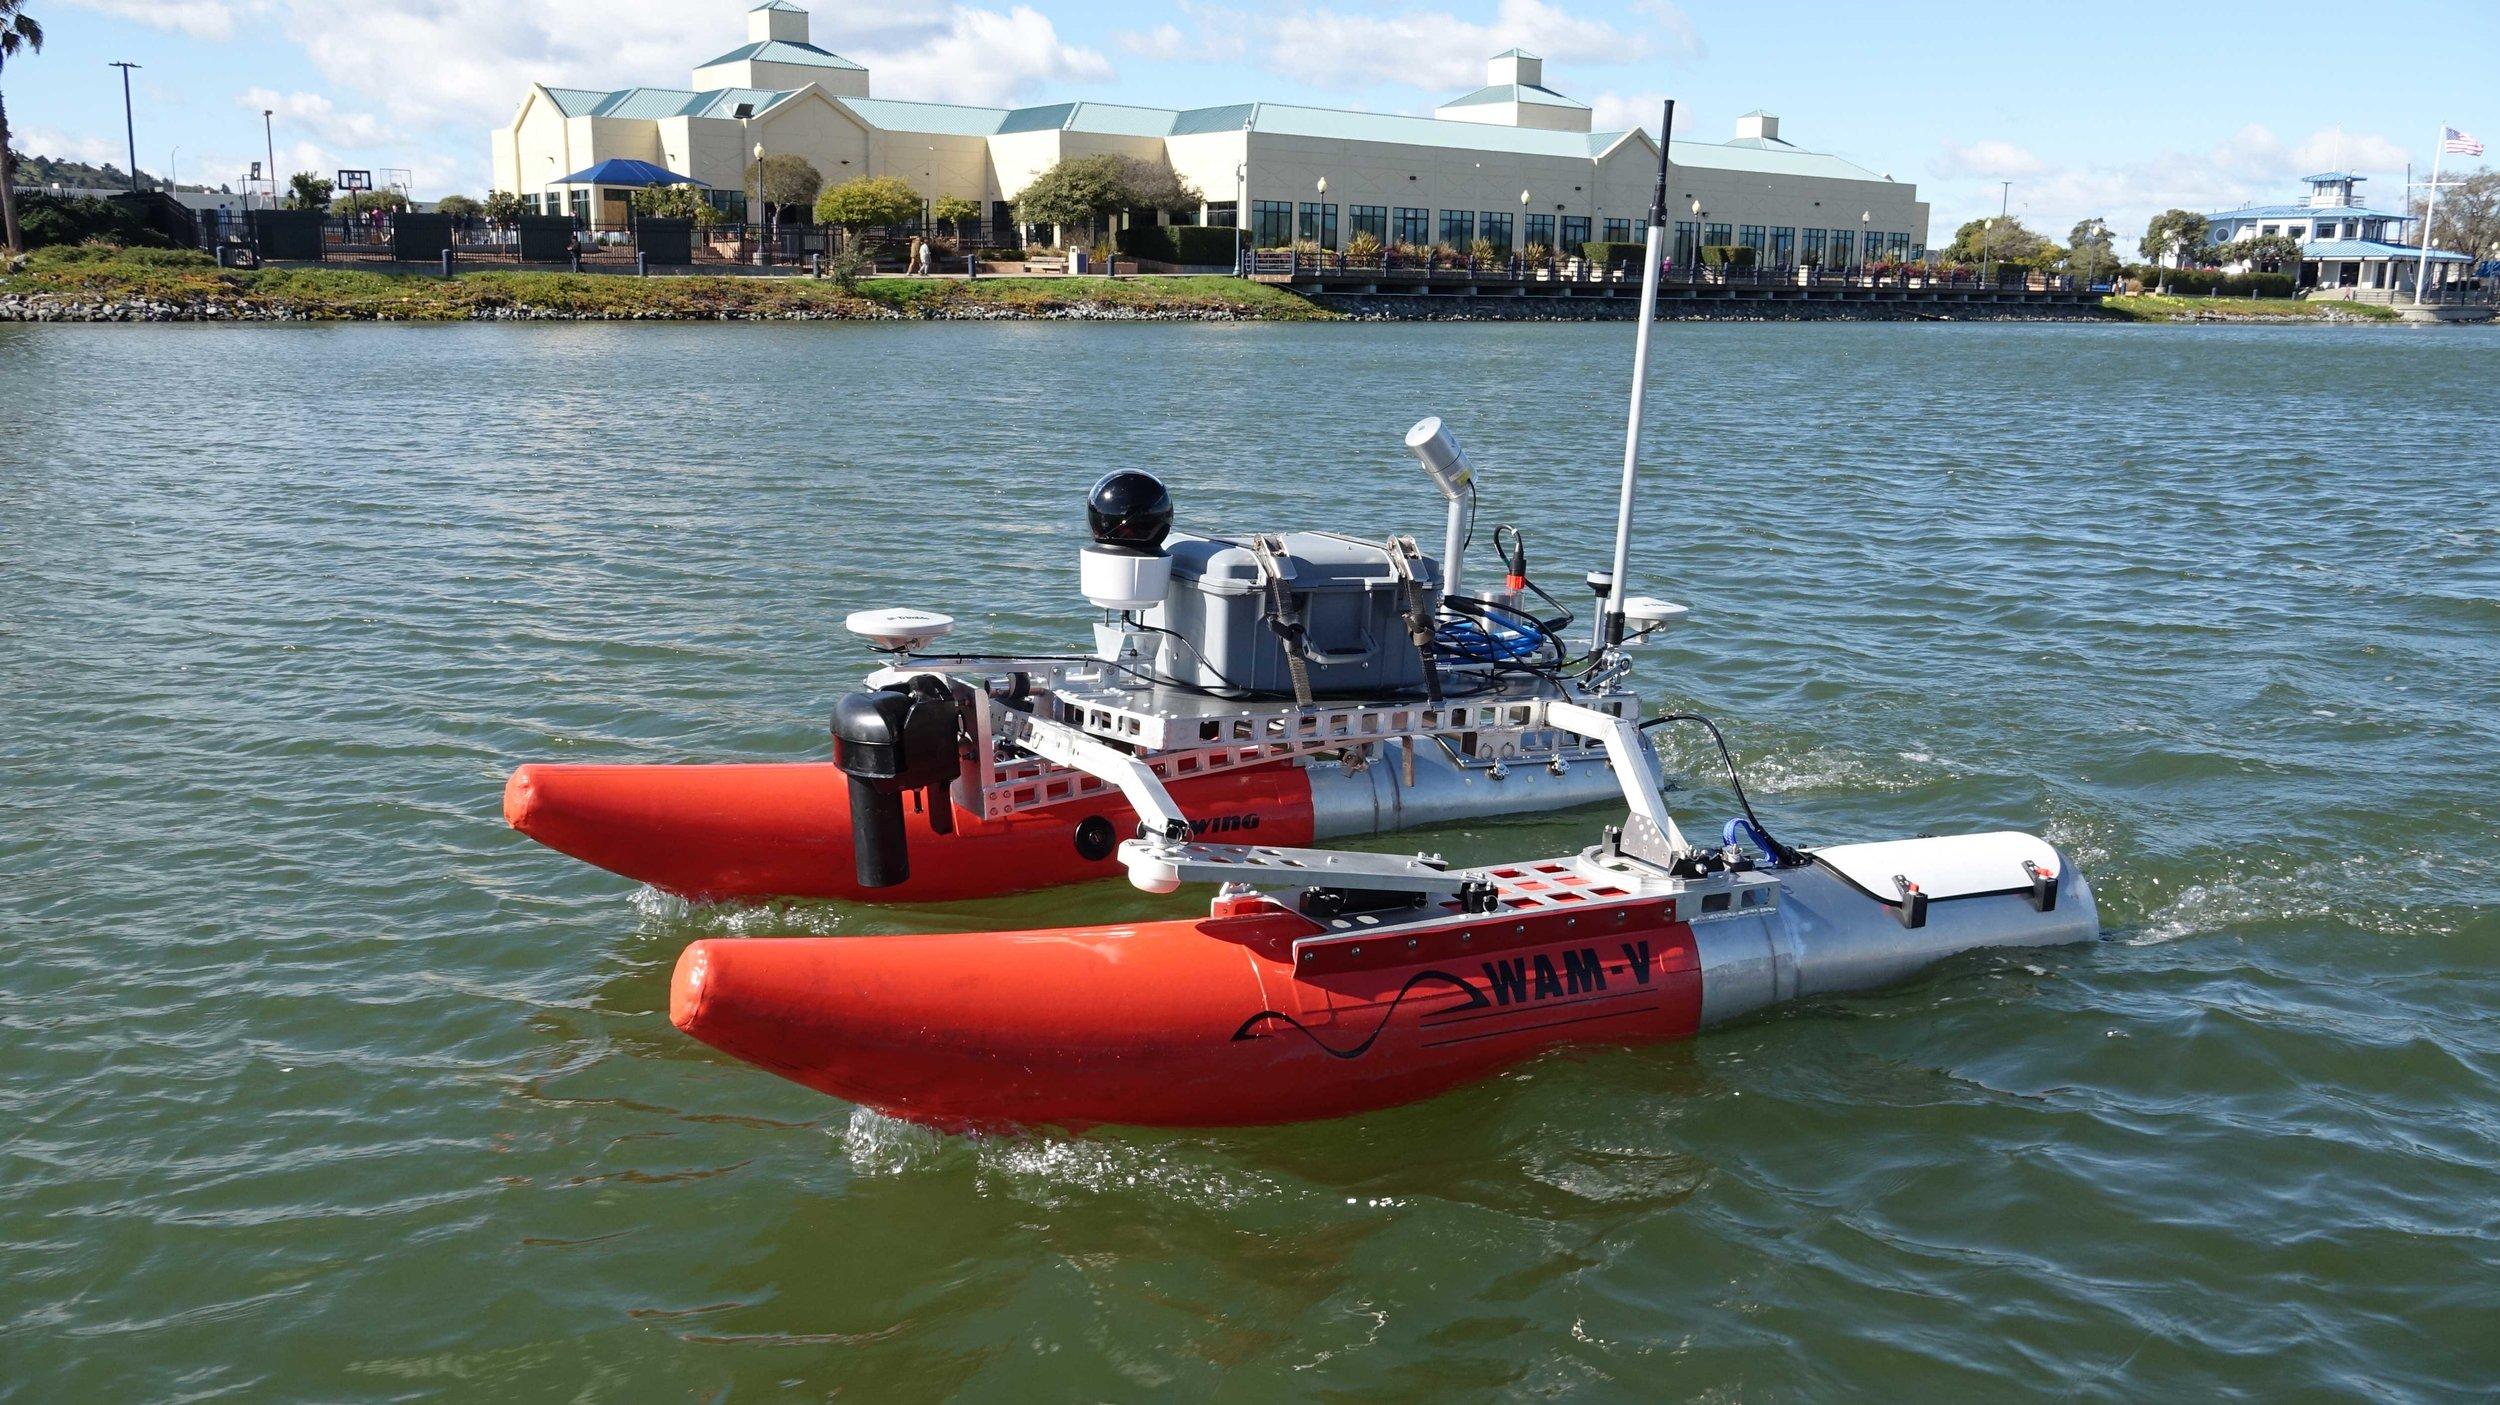 WAM-V 8 ASV for Harbor Survey